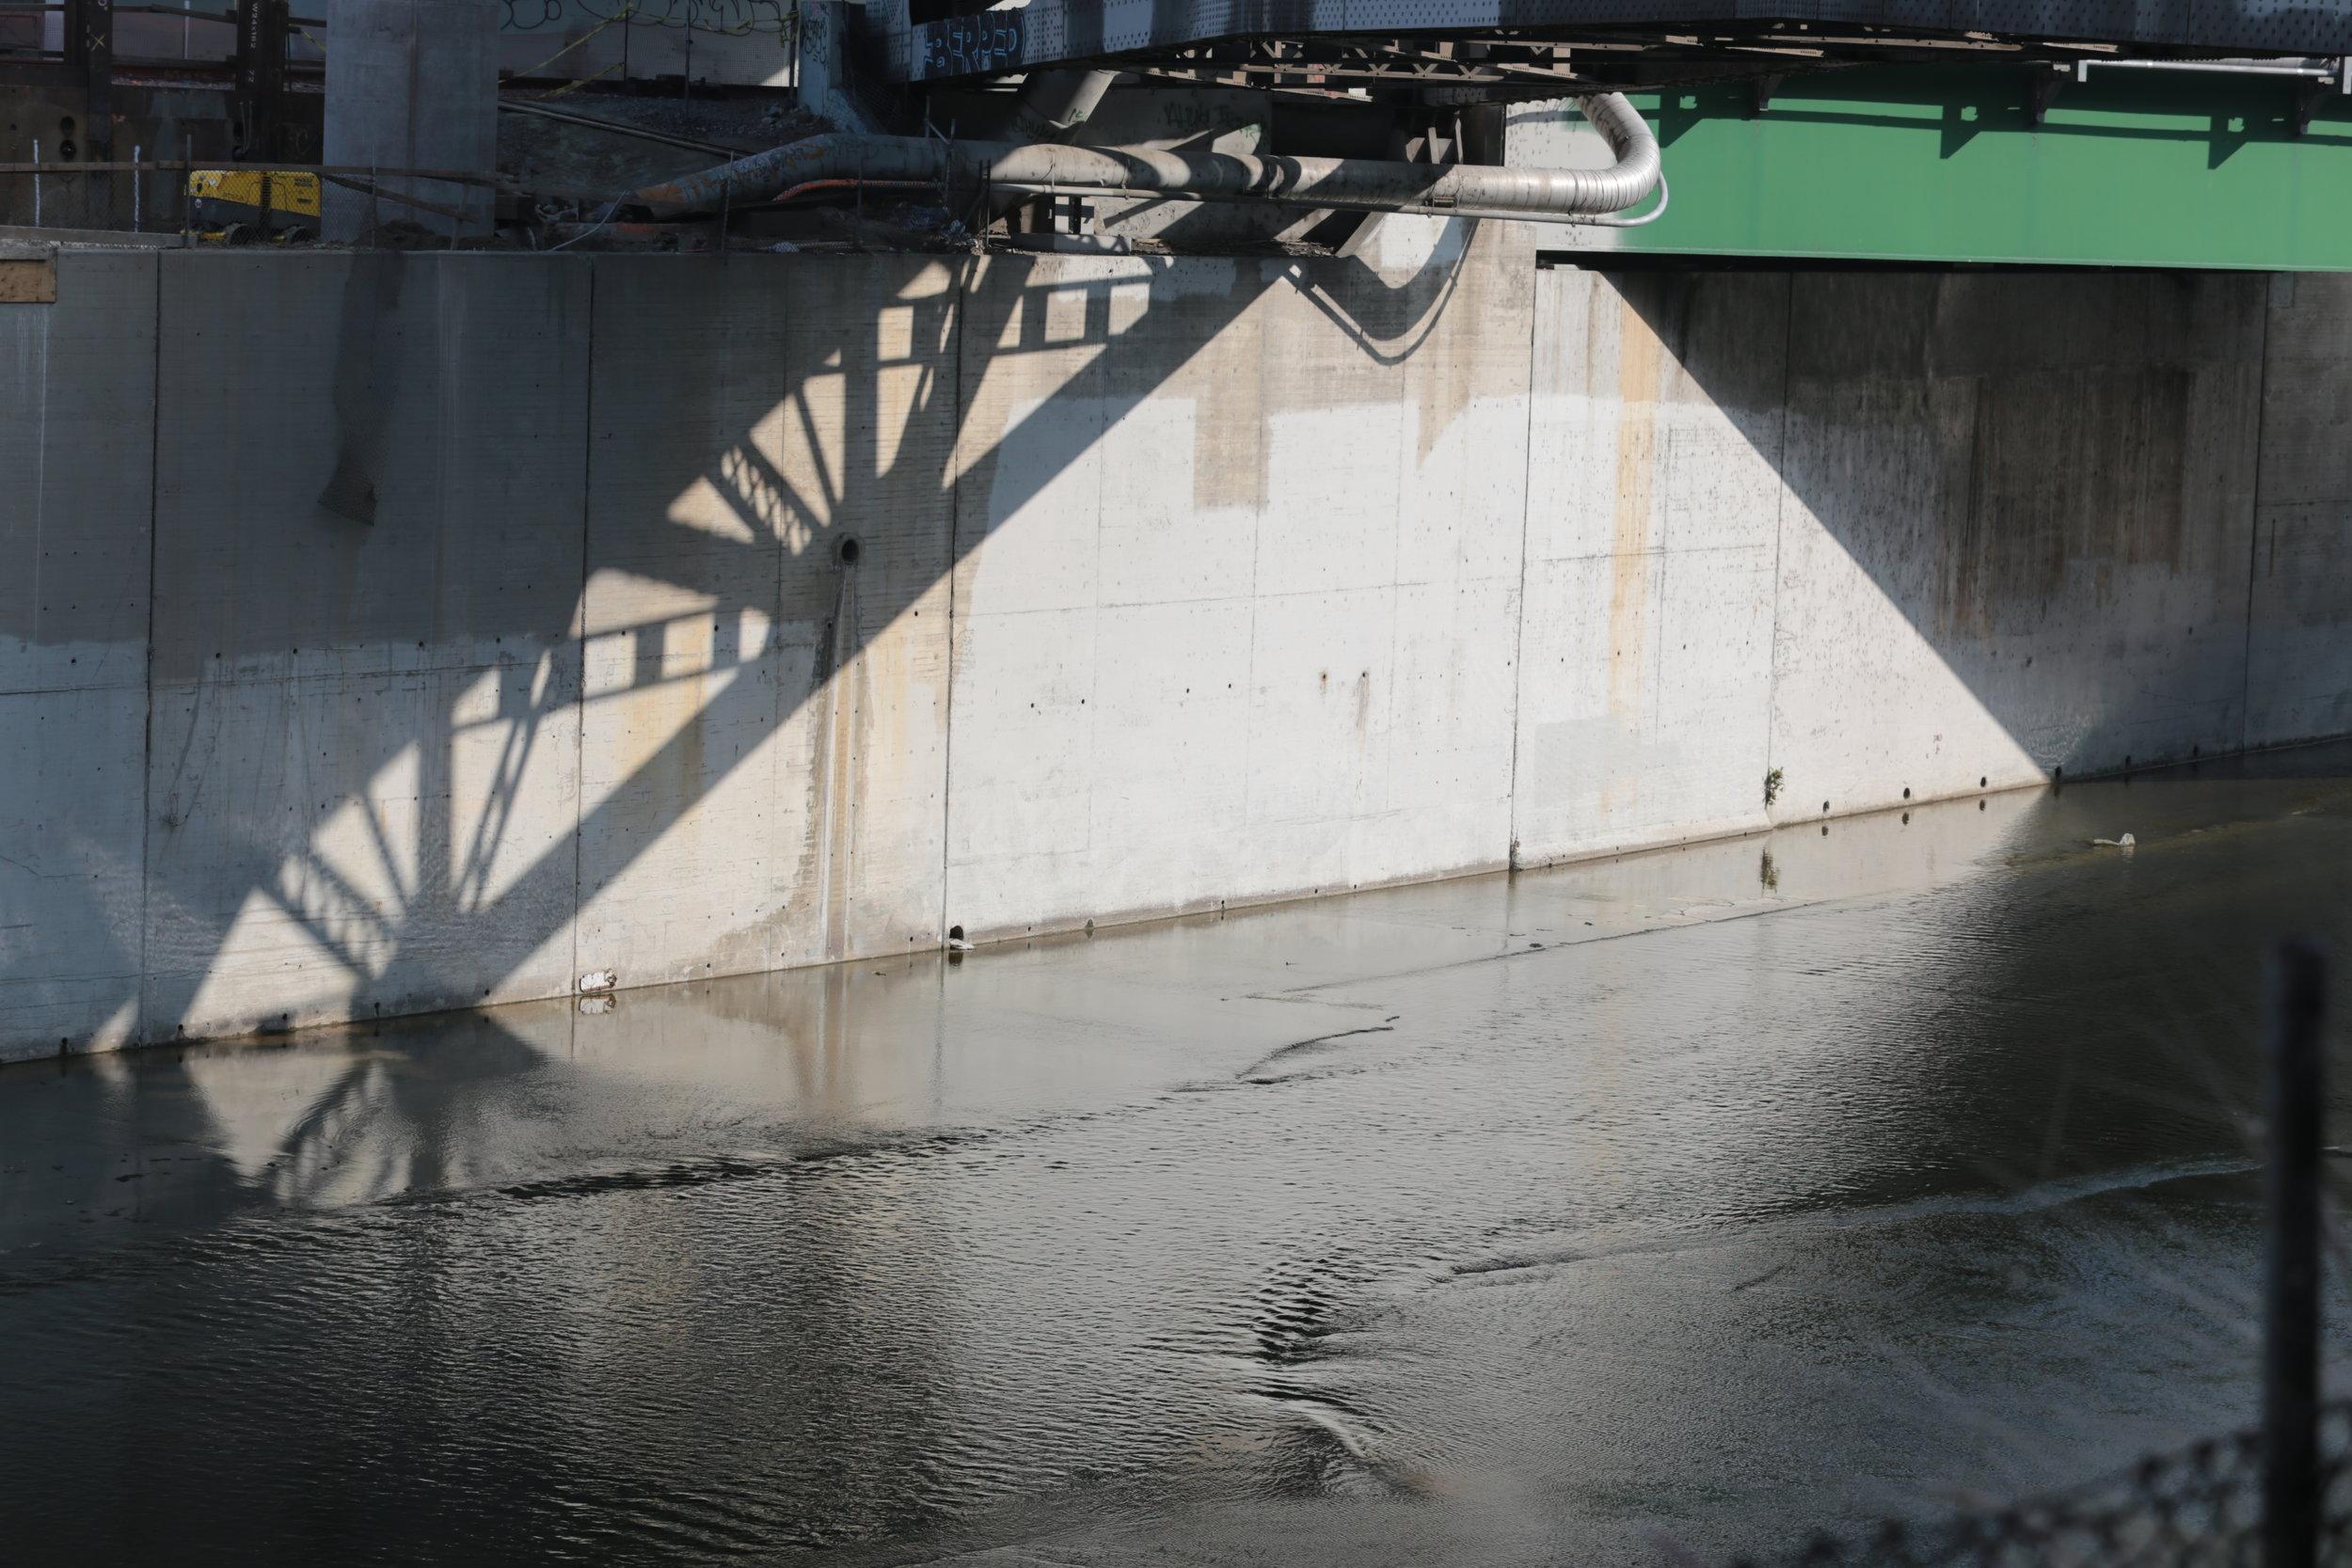 Shadows of the old Riverside Drive bridge